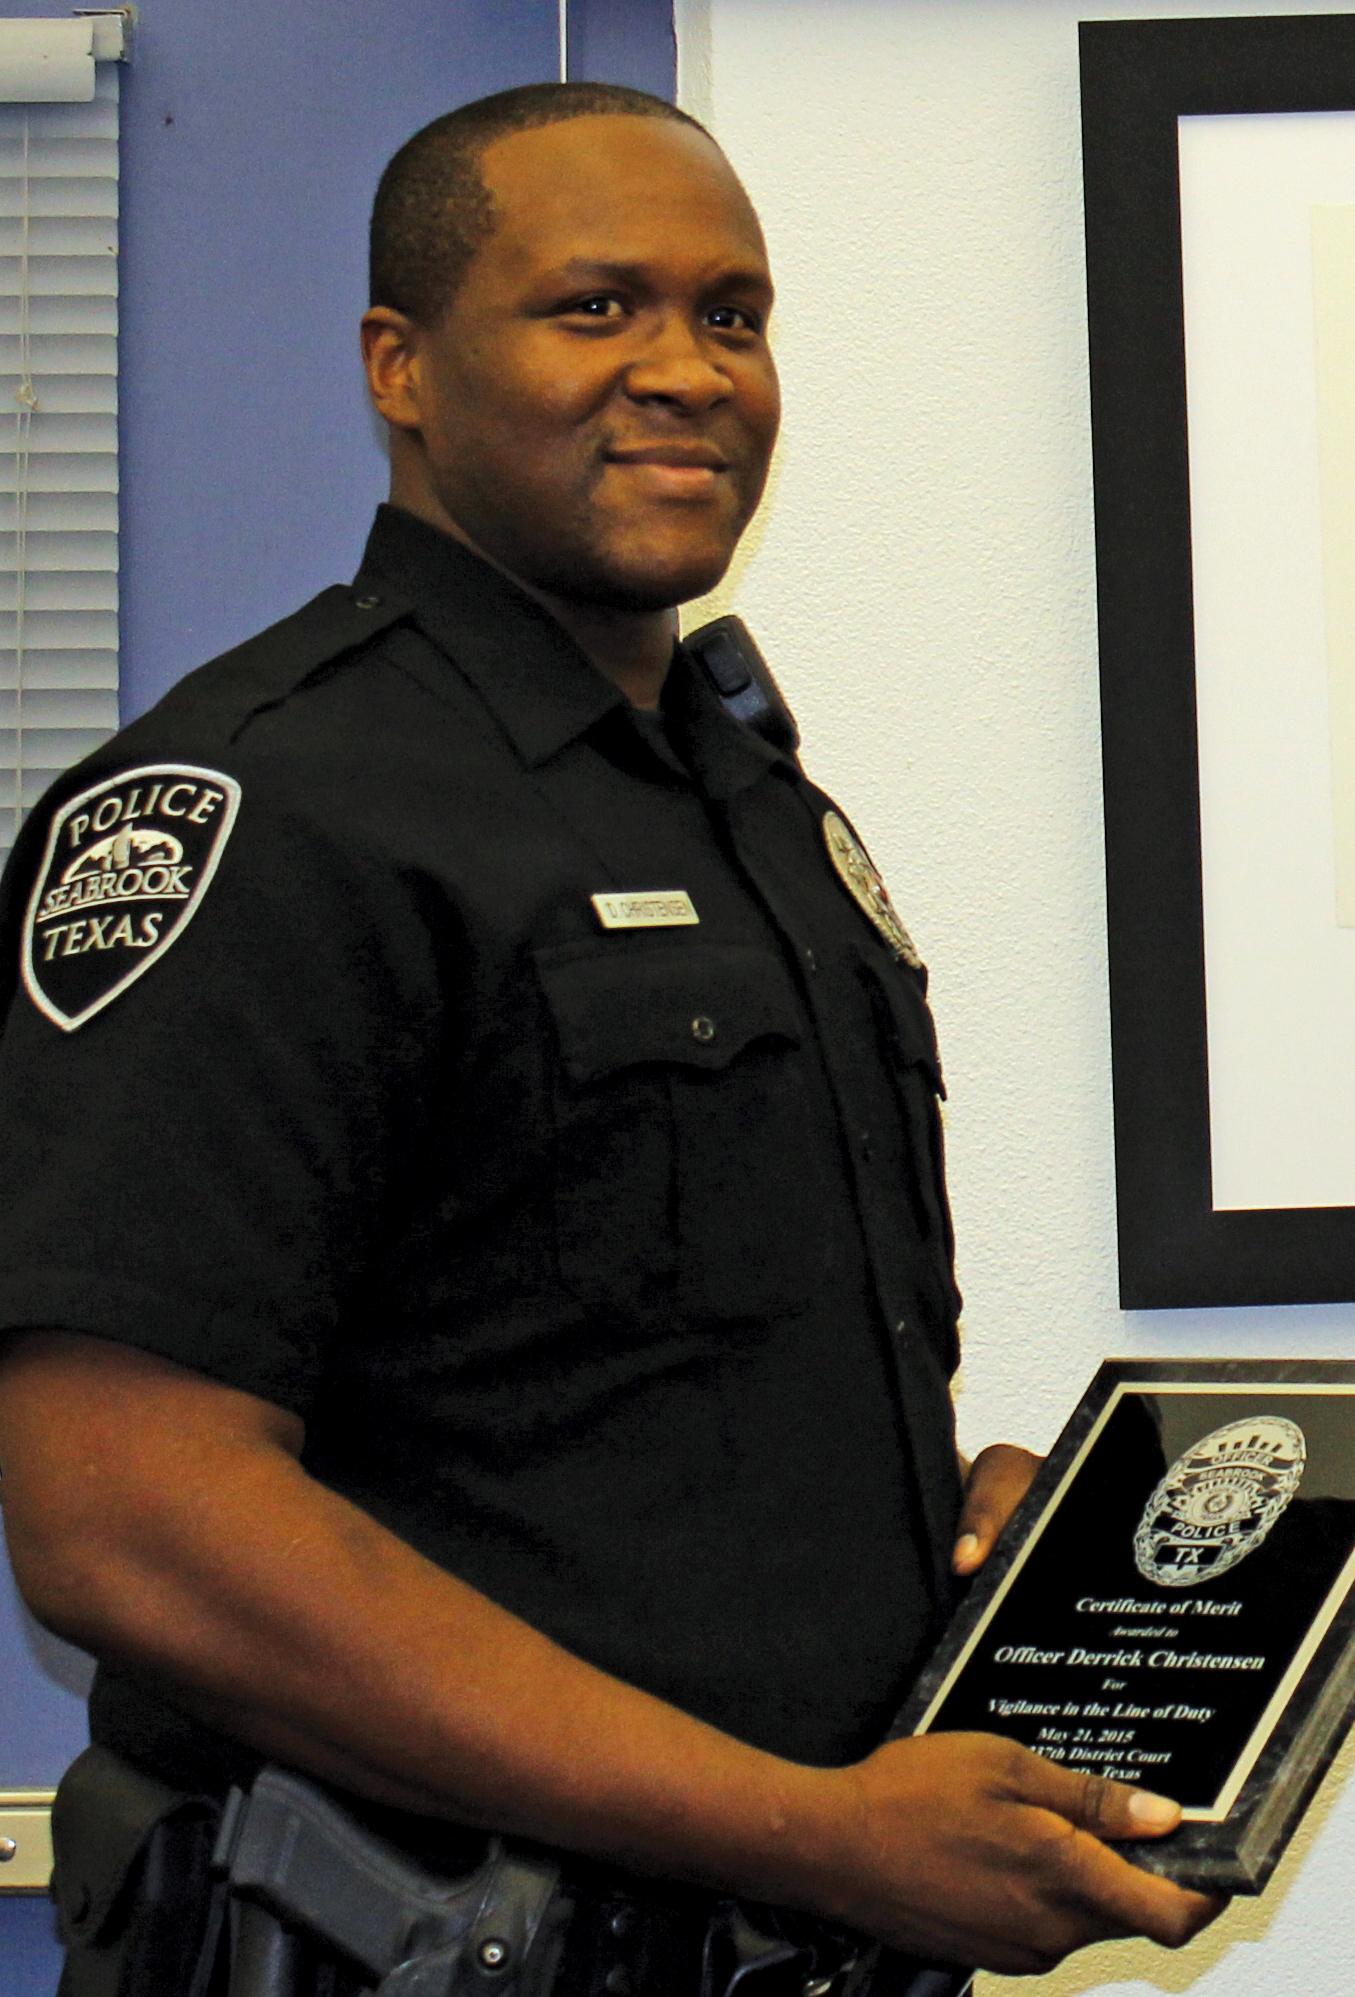 Seabrook Police Officer Derrick Christensen